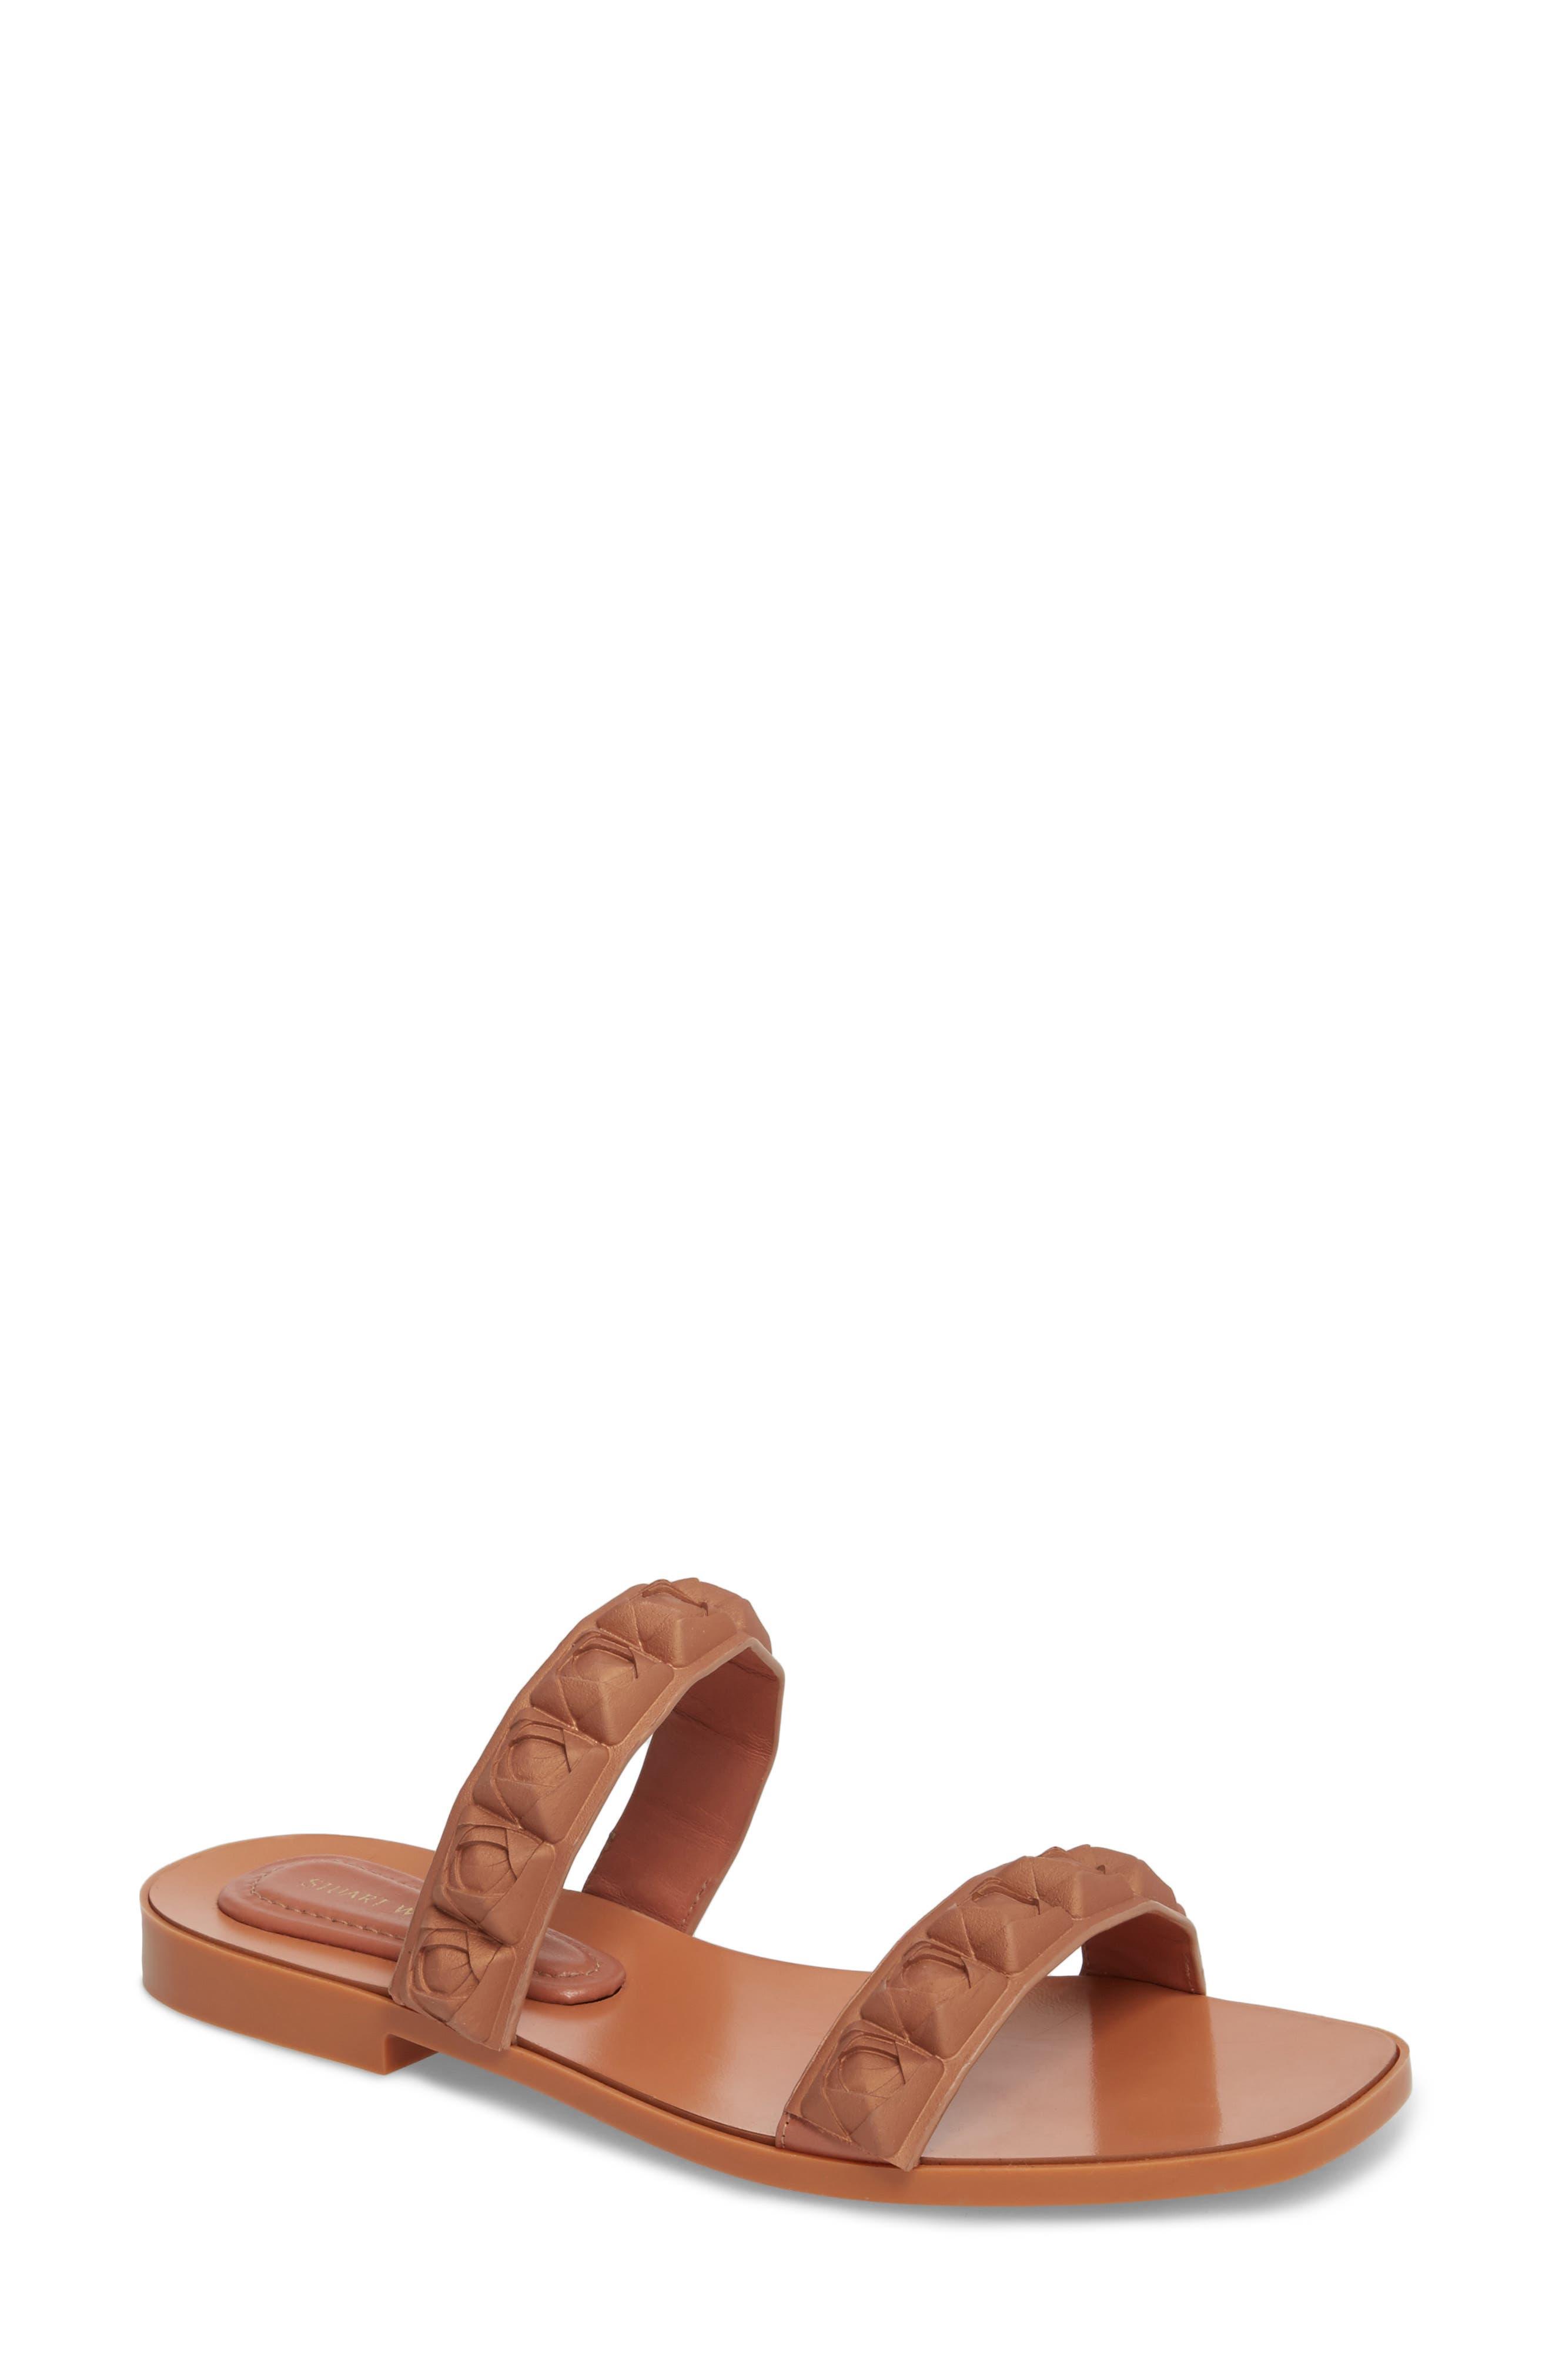 Rosita Dual Strap Slide Sandal,                             Main thumbnail 3, color,